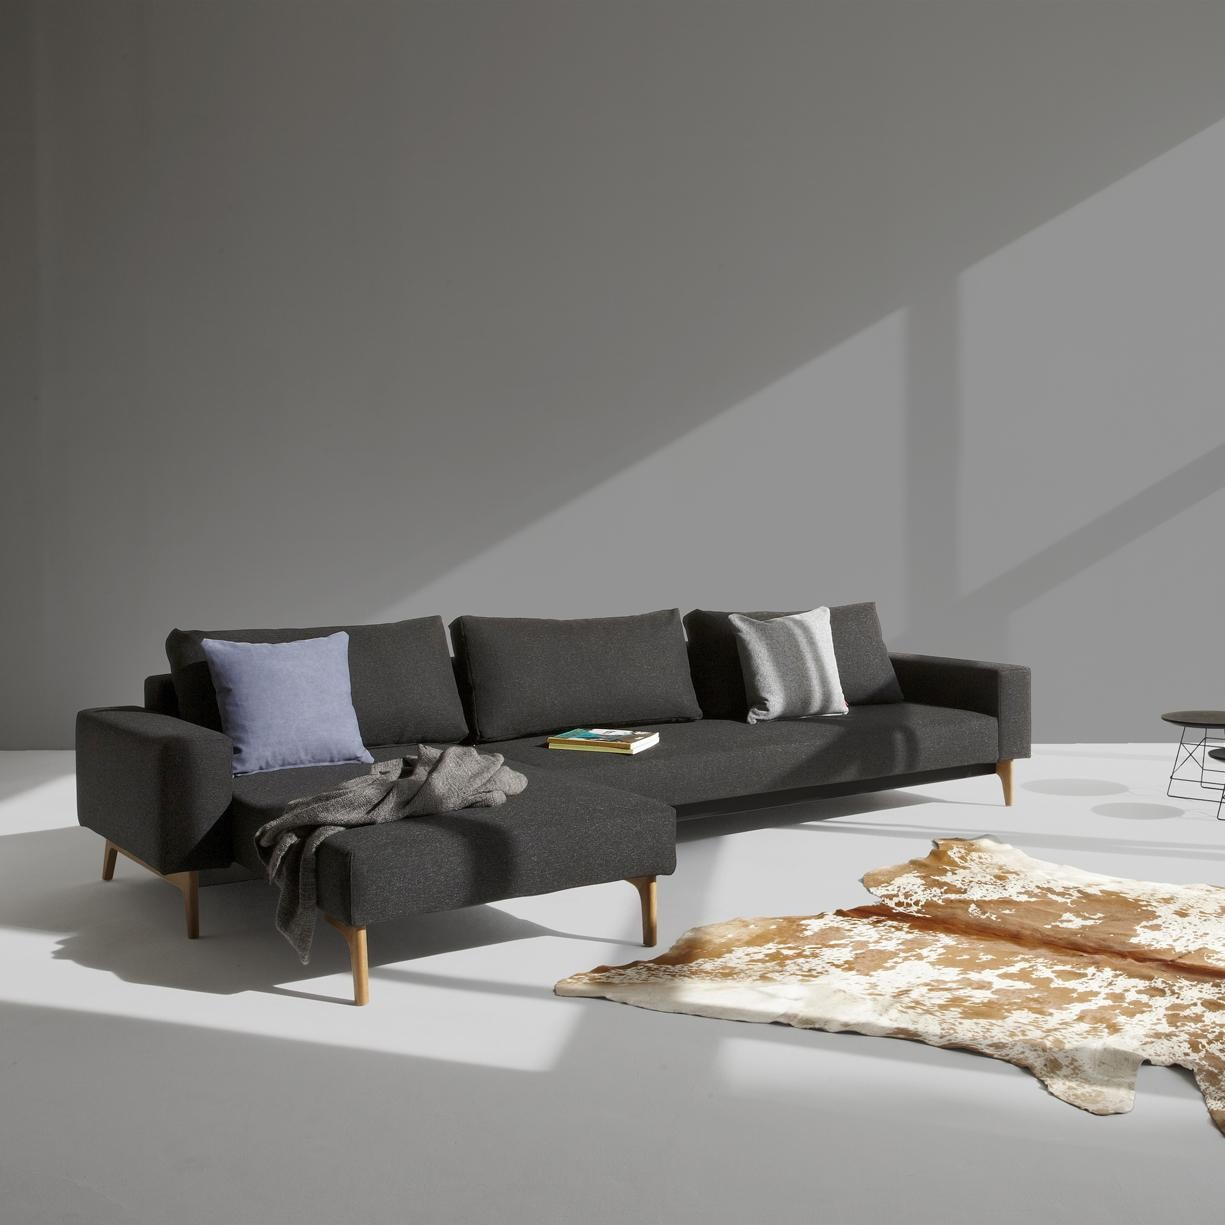 Innovation Idun Lounger Sofa Bed Ambientedirect